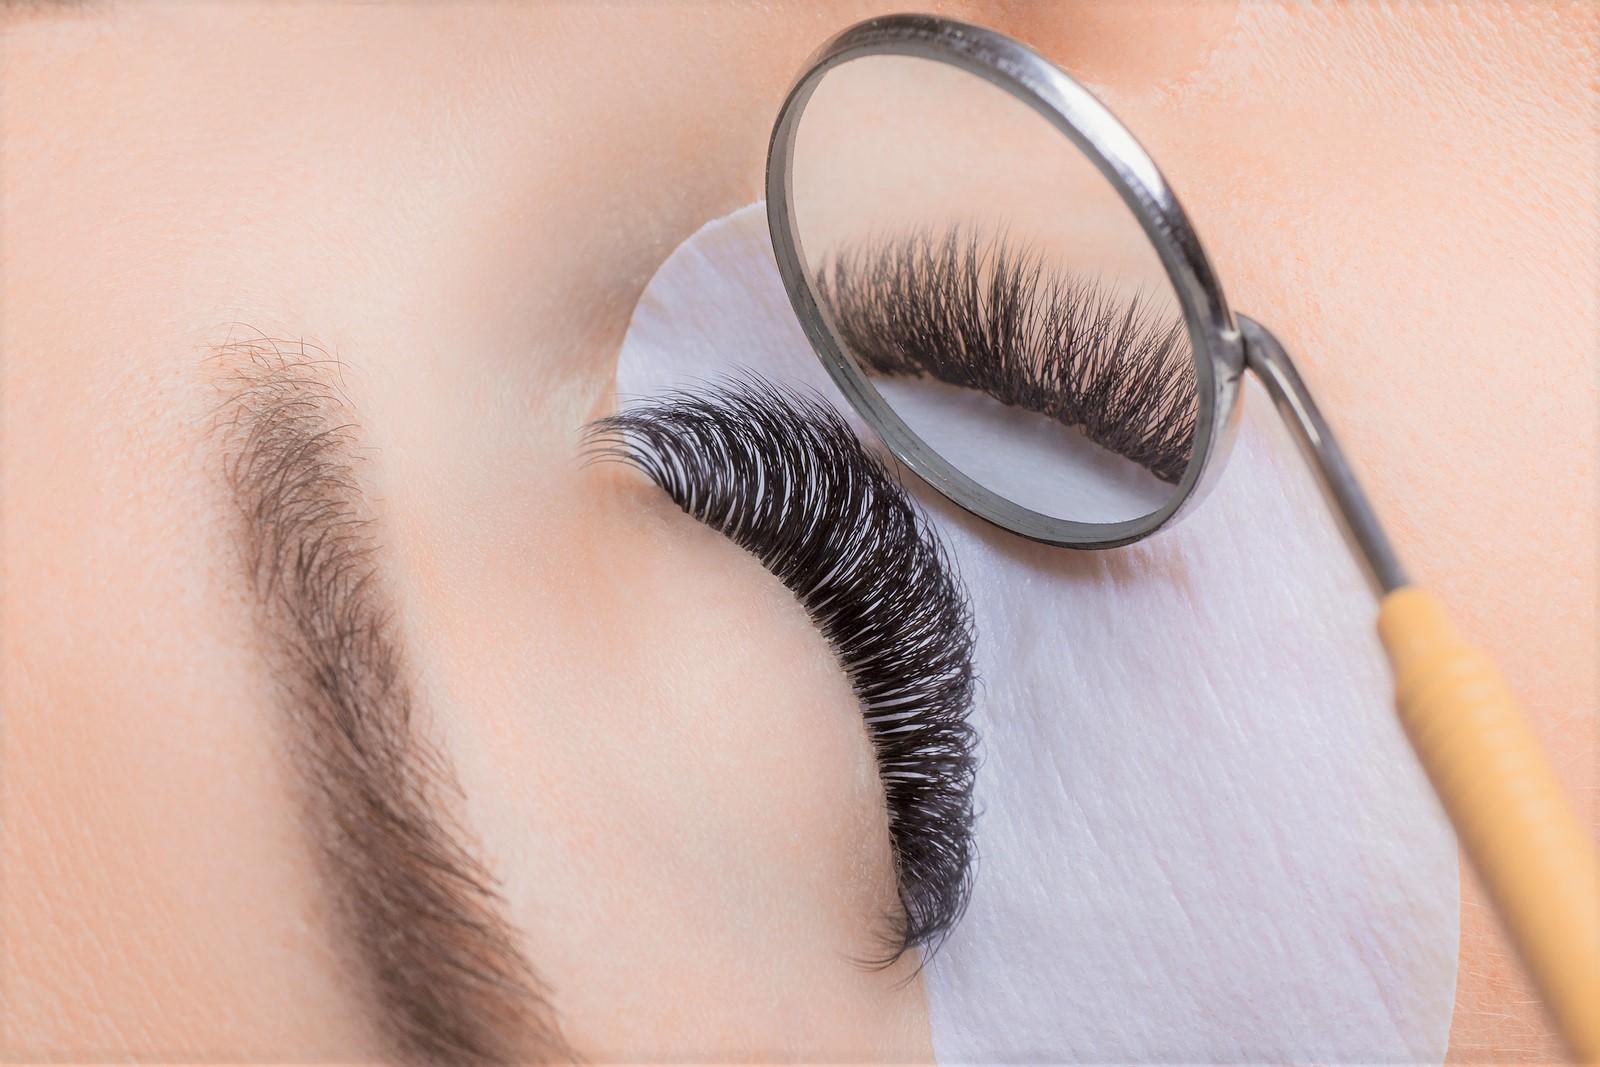 bigstock-Eyelash-Extension-Procedure-W-257367718.jpg